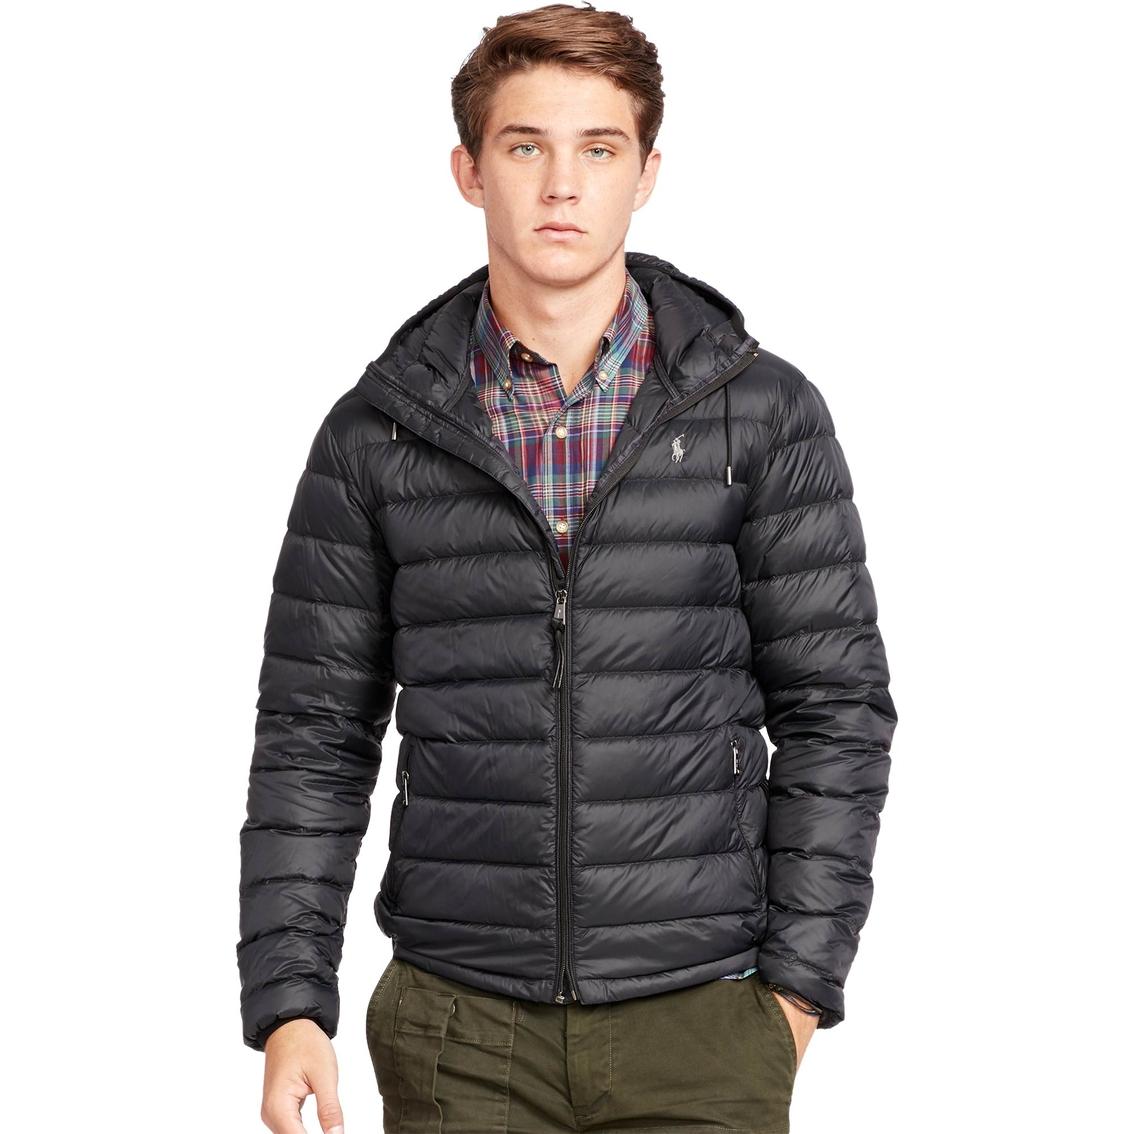 c78f0e05 Polo Ralph Lauren Packable Hooded Down Vest | Polo Ralph Lauren ...